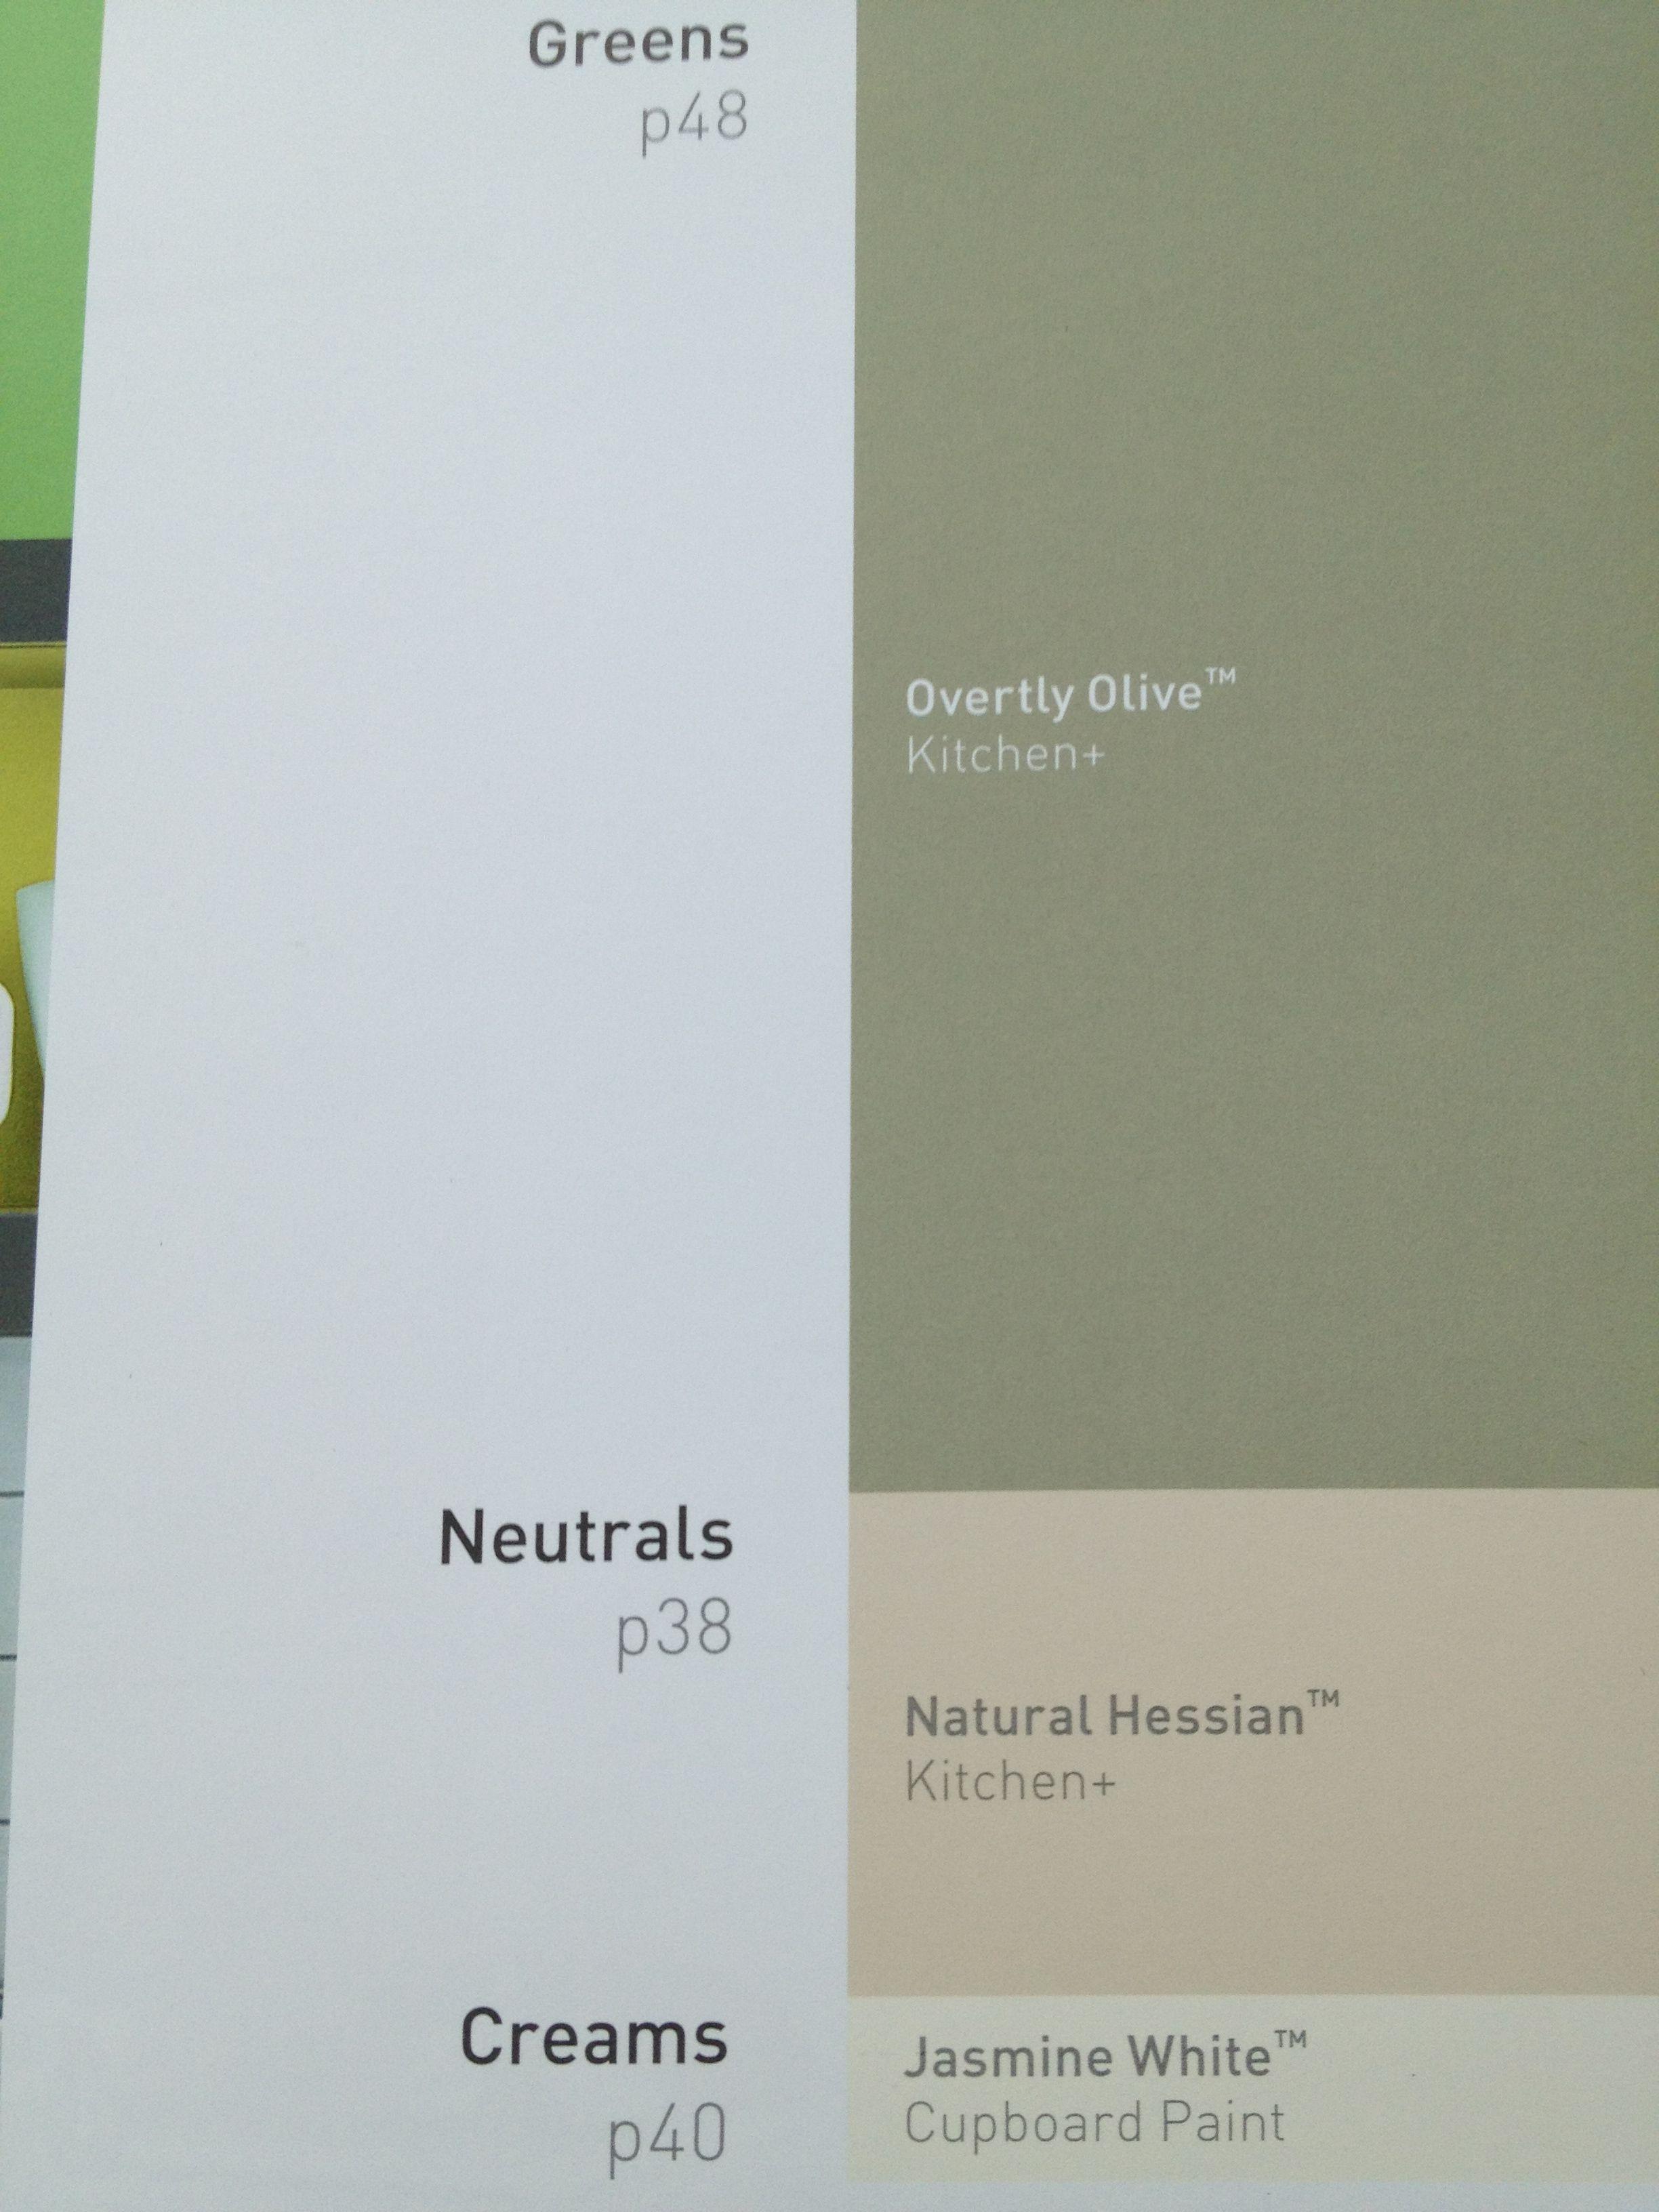 Dulux Green Based Colour Scheme Bedroom Pinterest